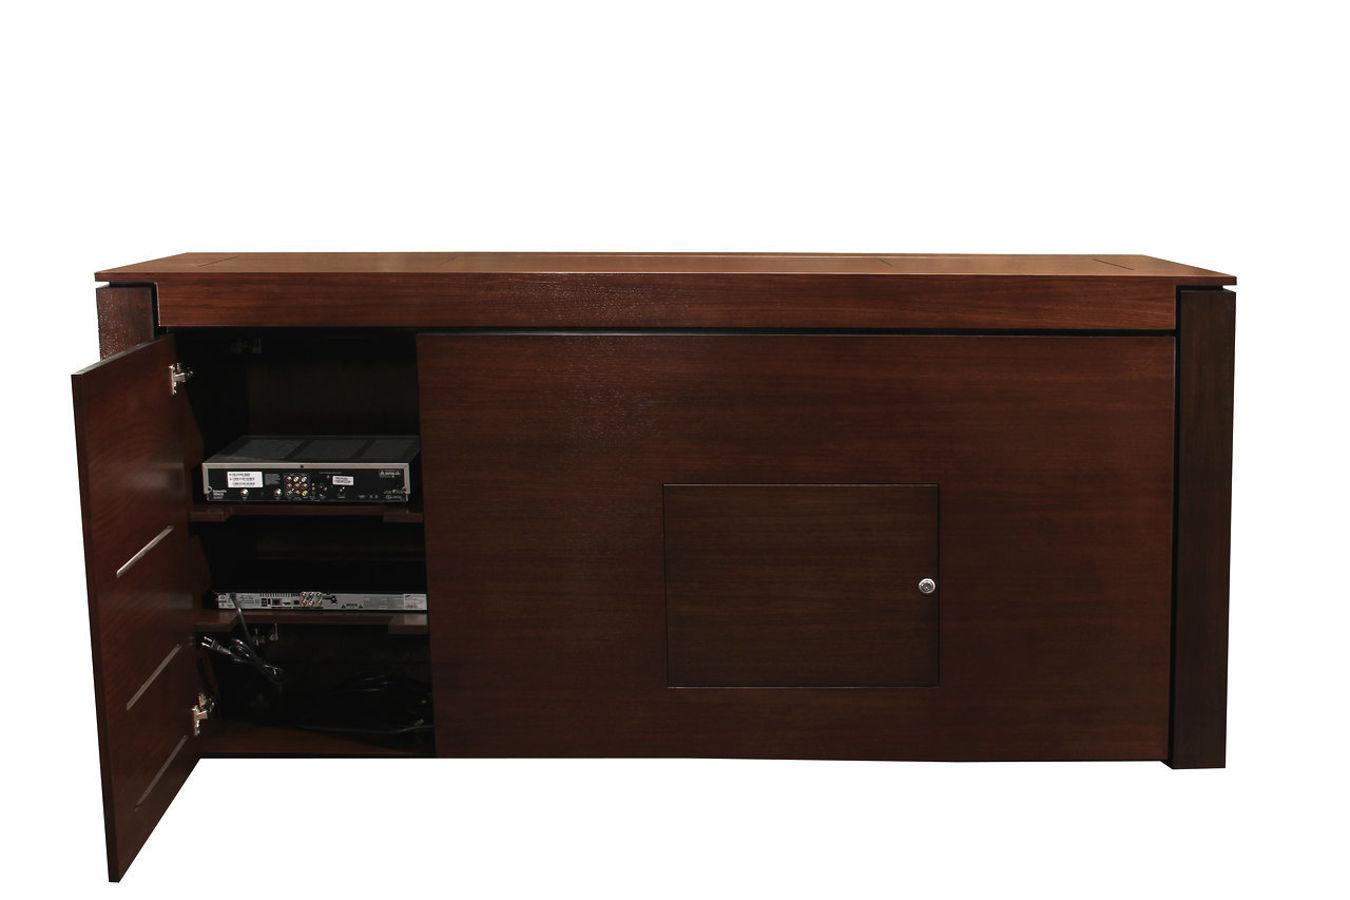 Retractable tv cabinet retractable tv stand modern buffet - Retractable tv cabinet living room furniture ...